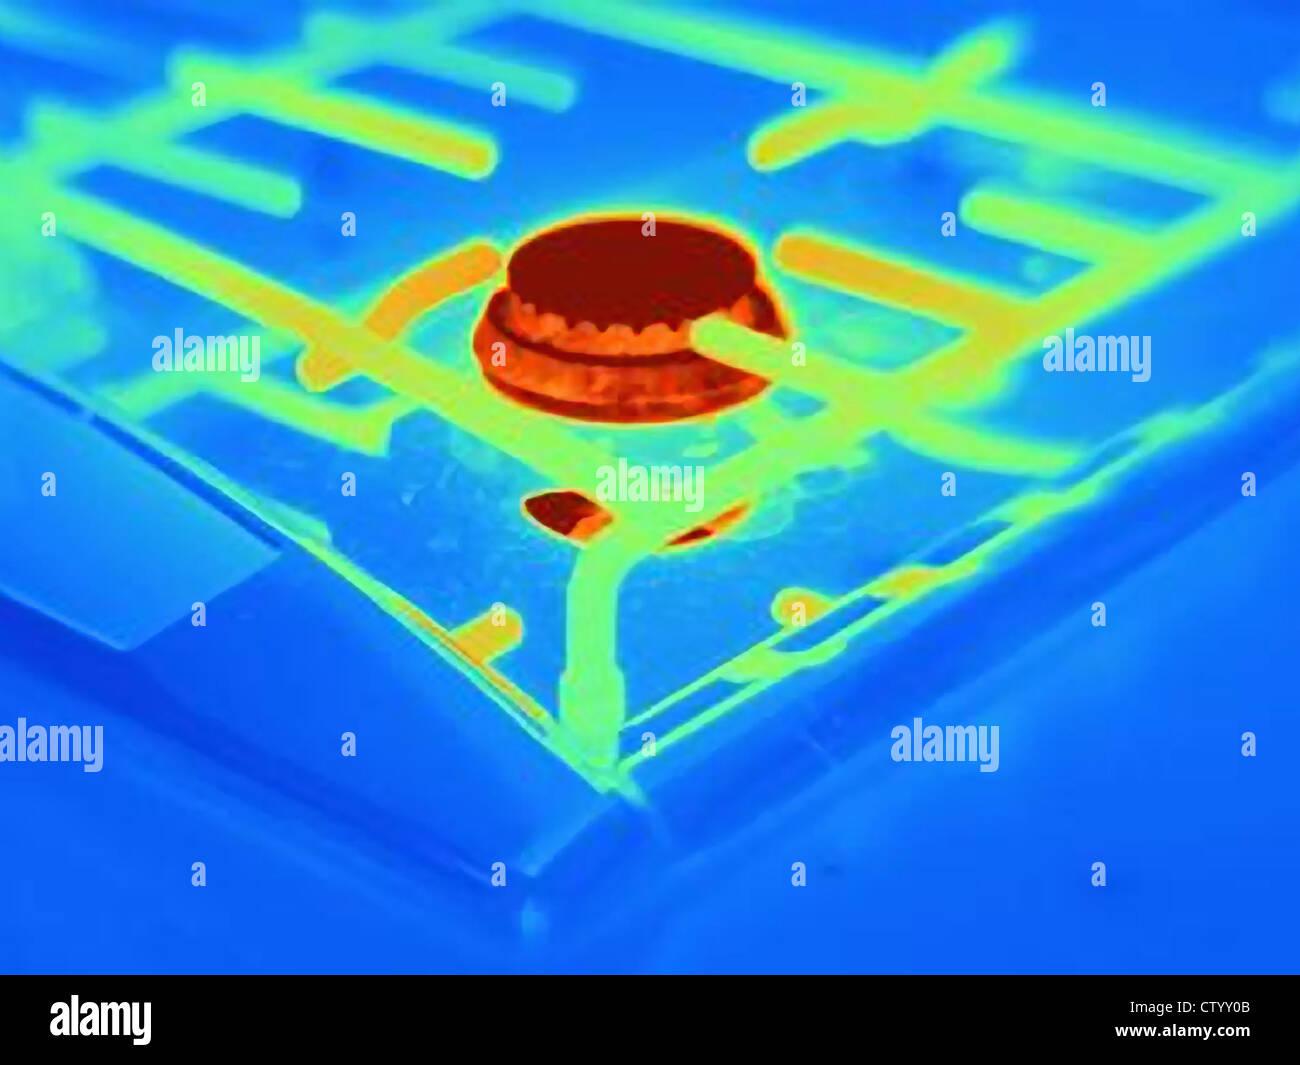 Immagine termica del bruciatore di stufa Immagini Stock